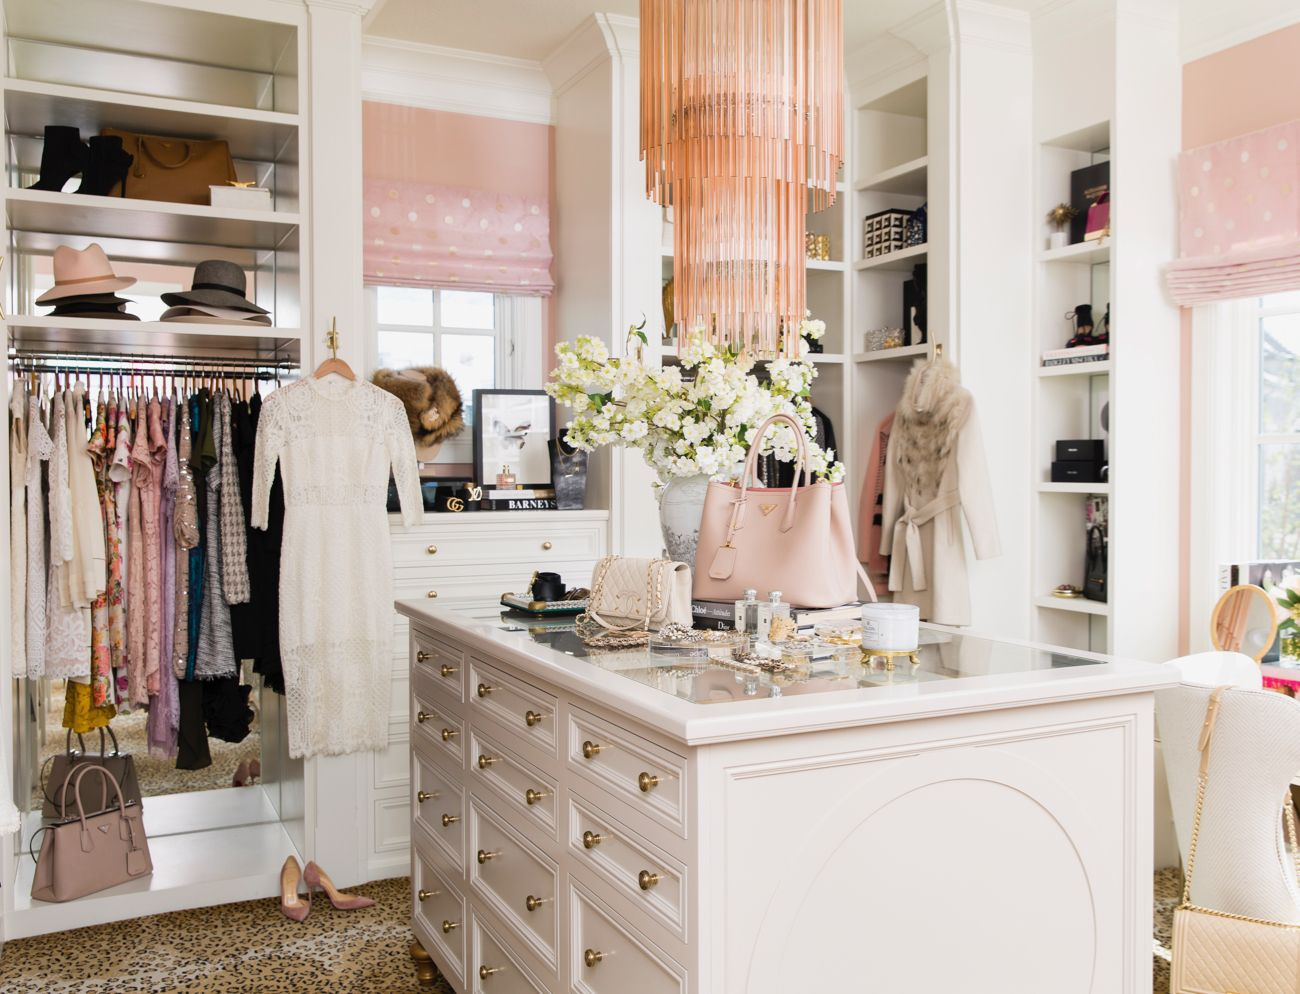 My Closet Revamp Dream Closet Design Closet Decor Walk In Closet